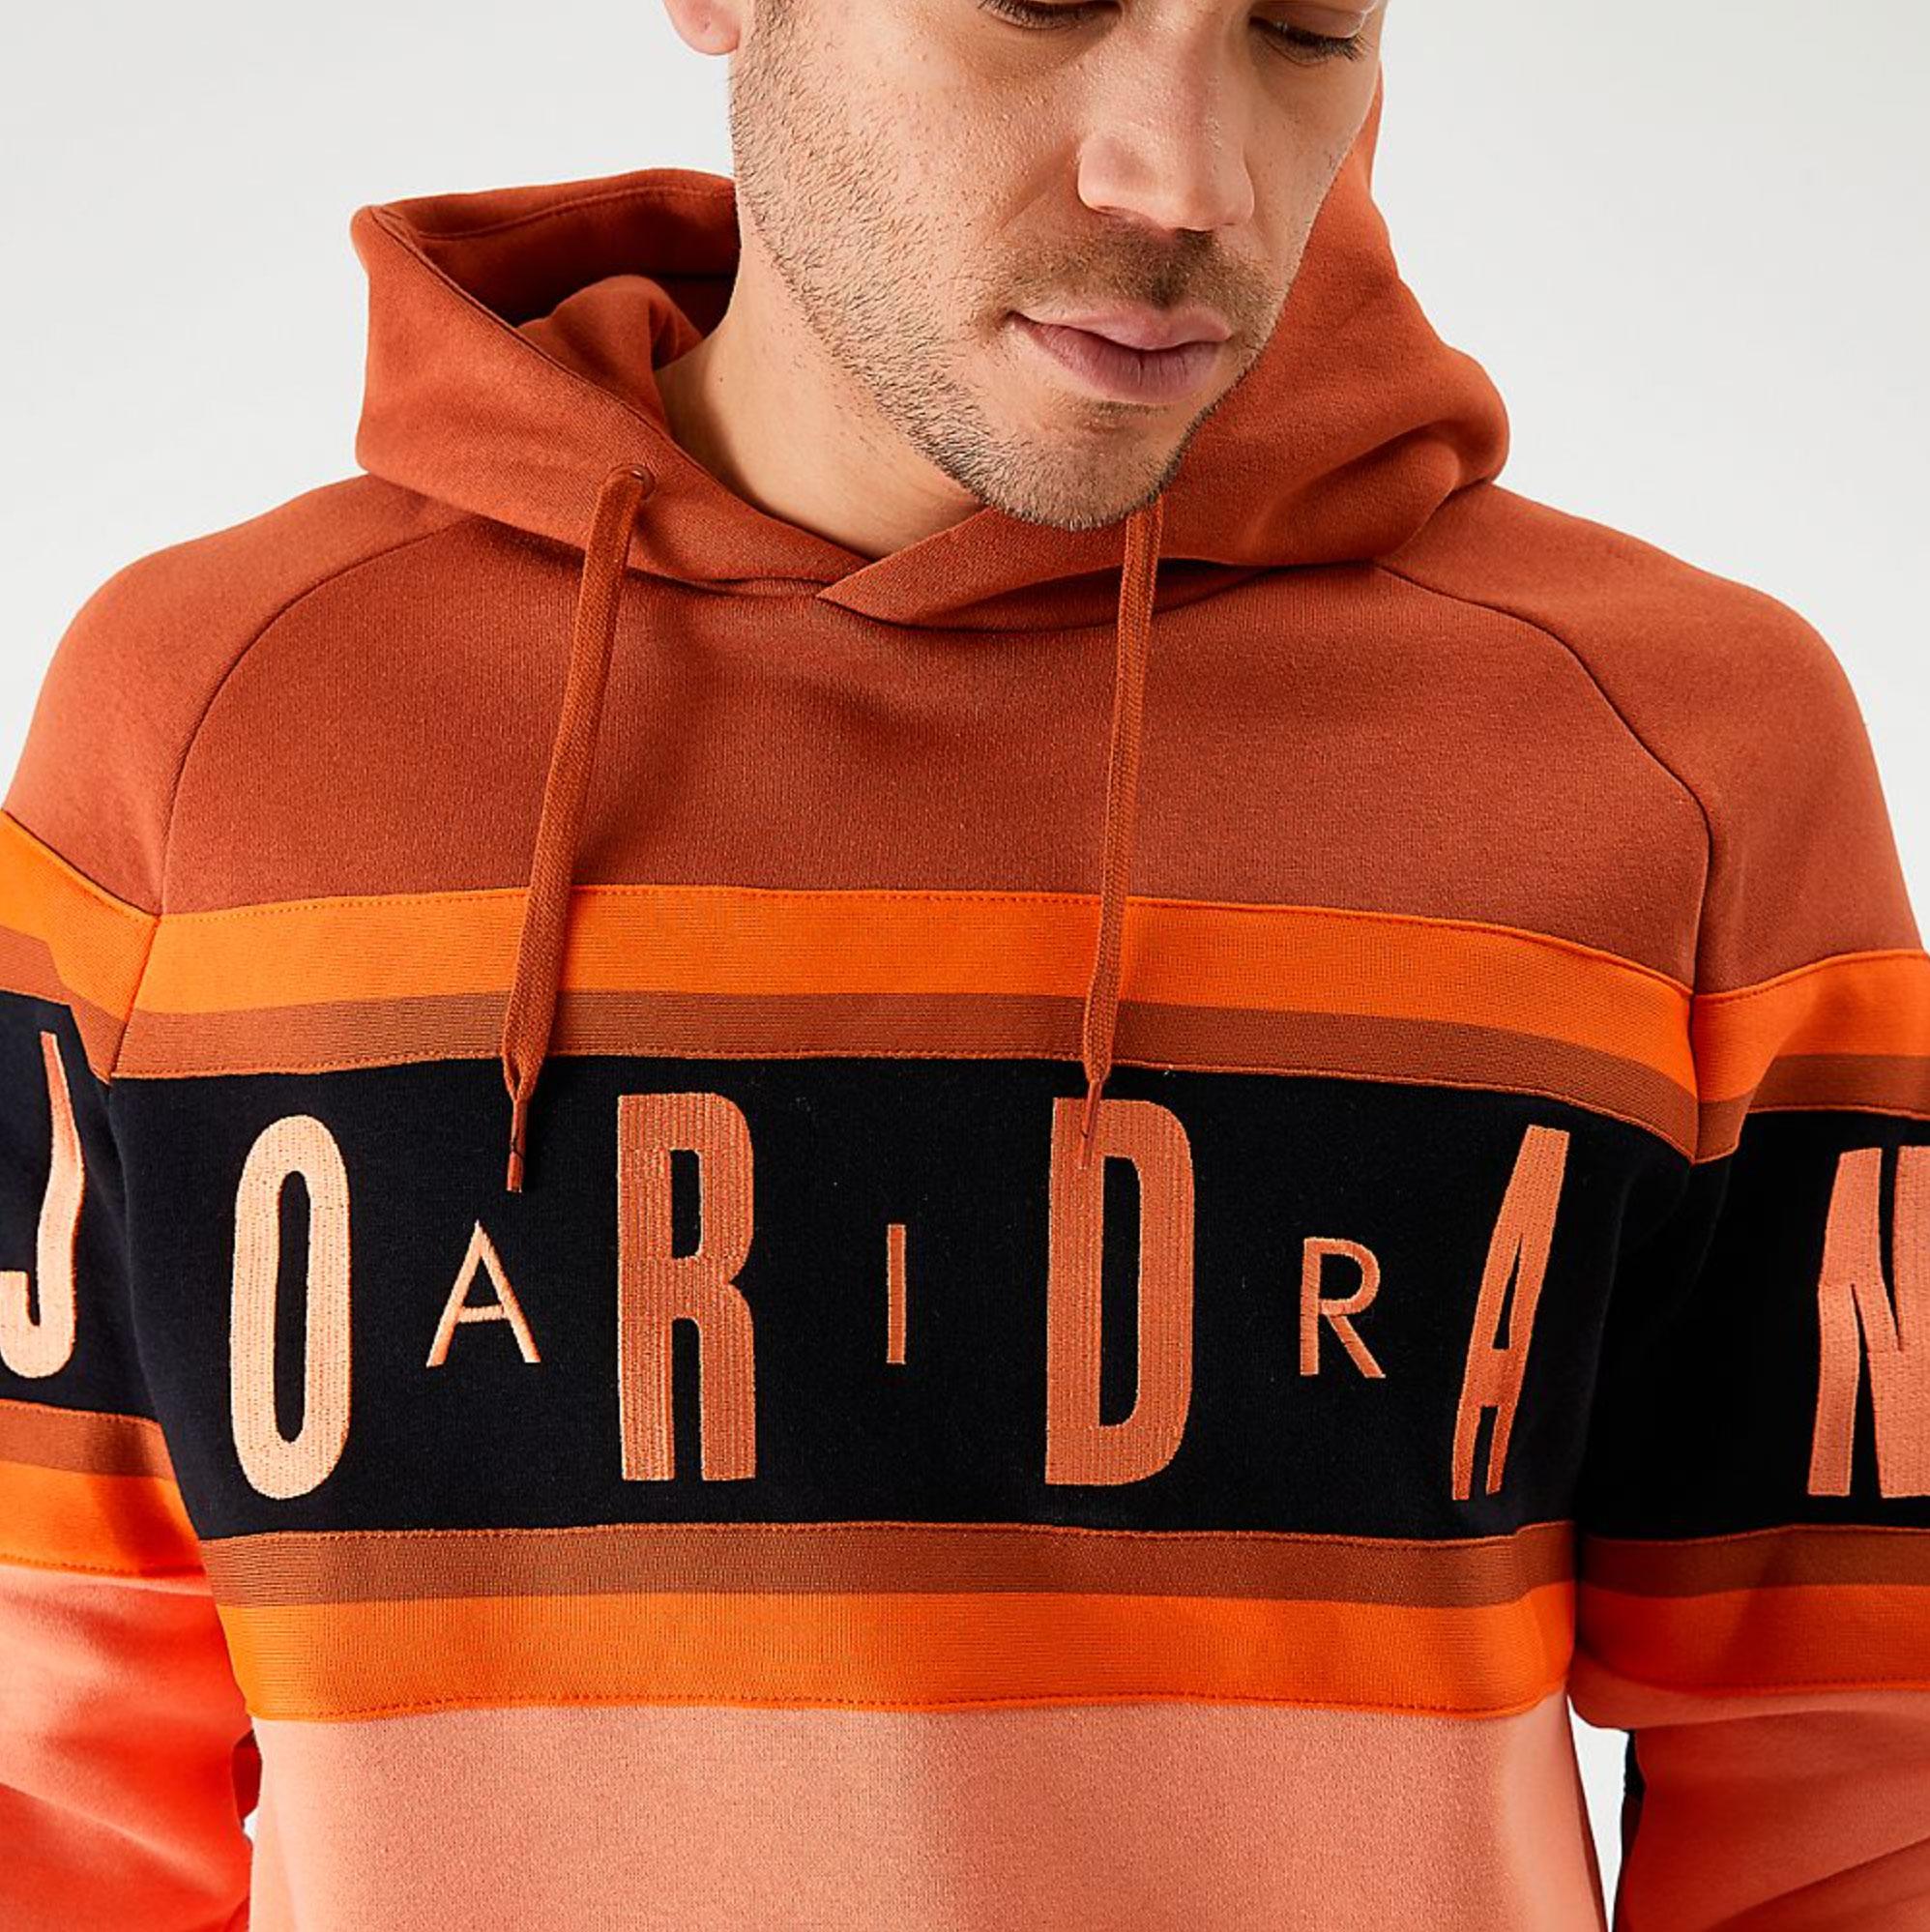 jordan-1-shattered-backboard-matching-hoody-1